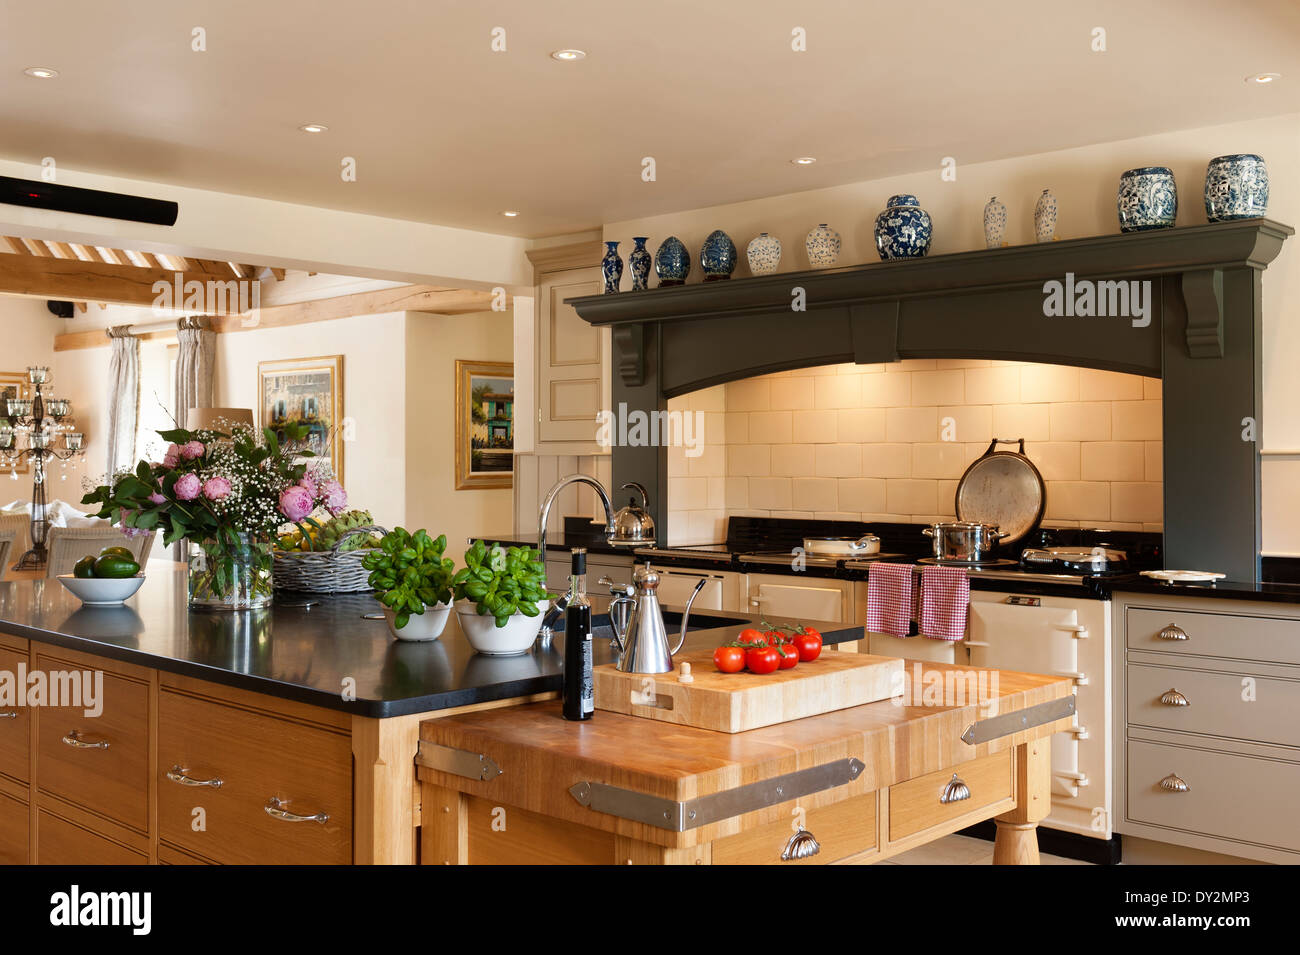 Küche-Insel-Aga-Herd Stockfoto, Bild: 68287019 - Alamy